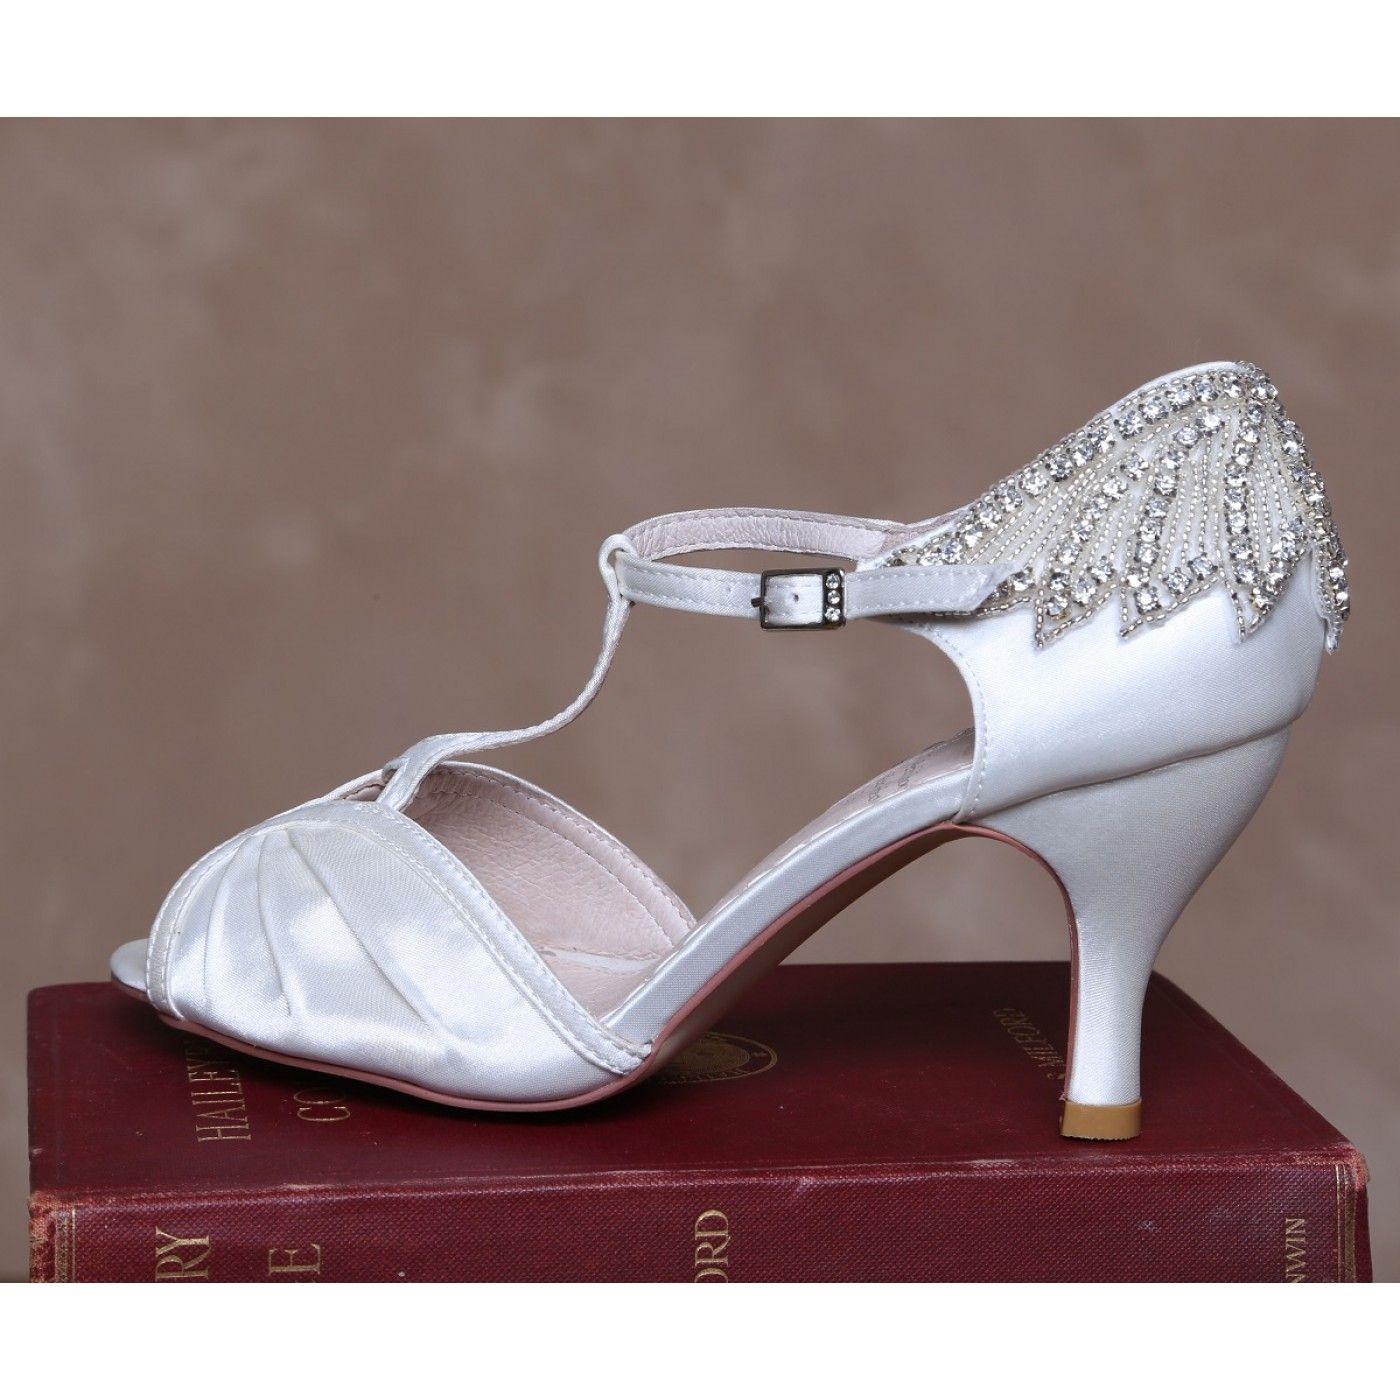 Wedding venue decorations ideas november 2018 Perfect Bridal Jessie Ivory Satin Vintage TBar Wedding Shoes